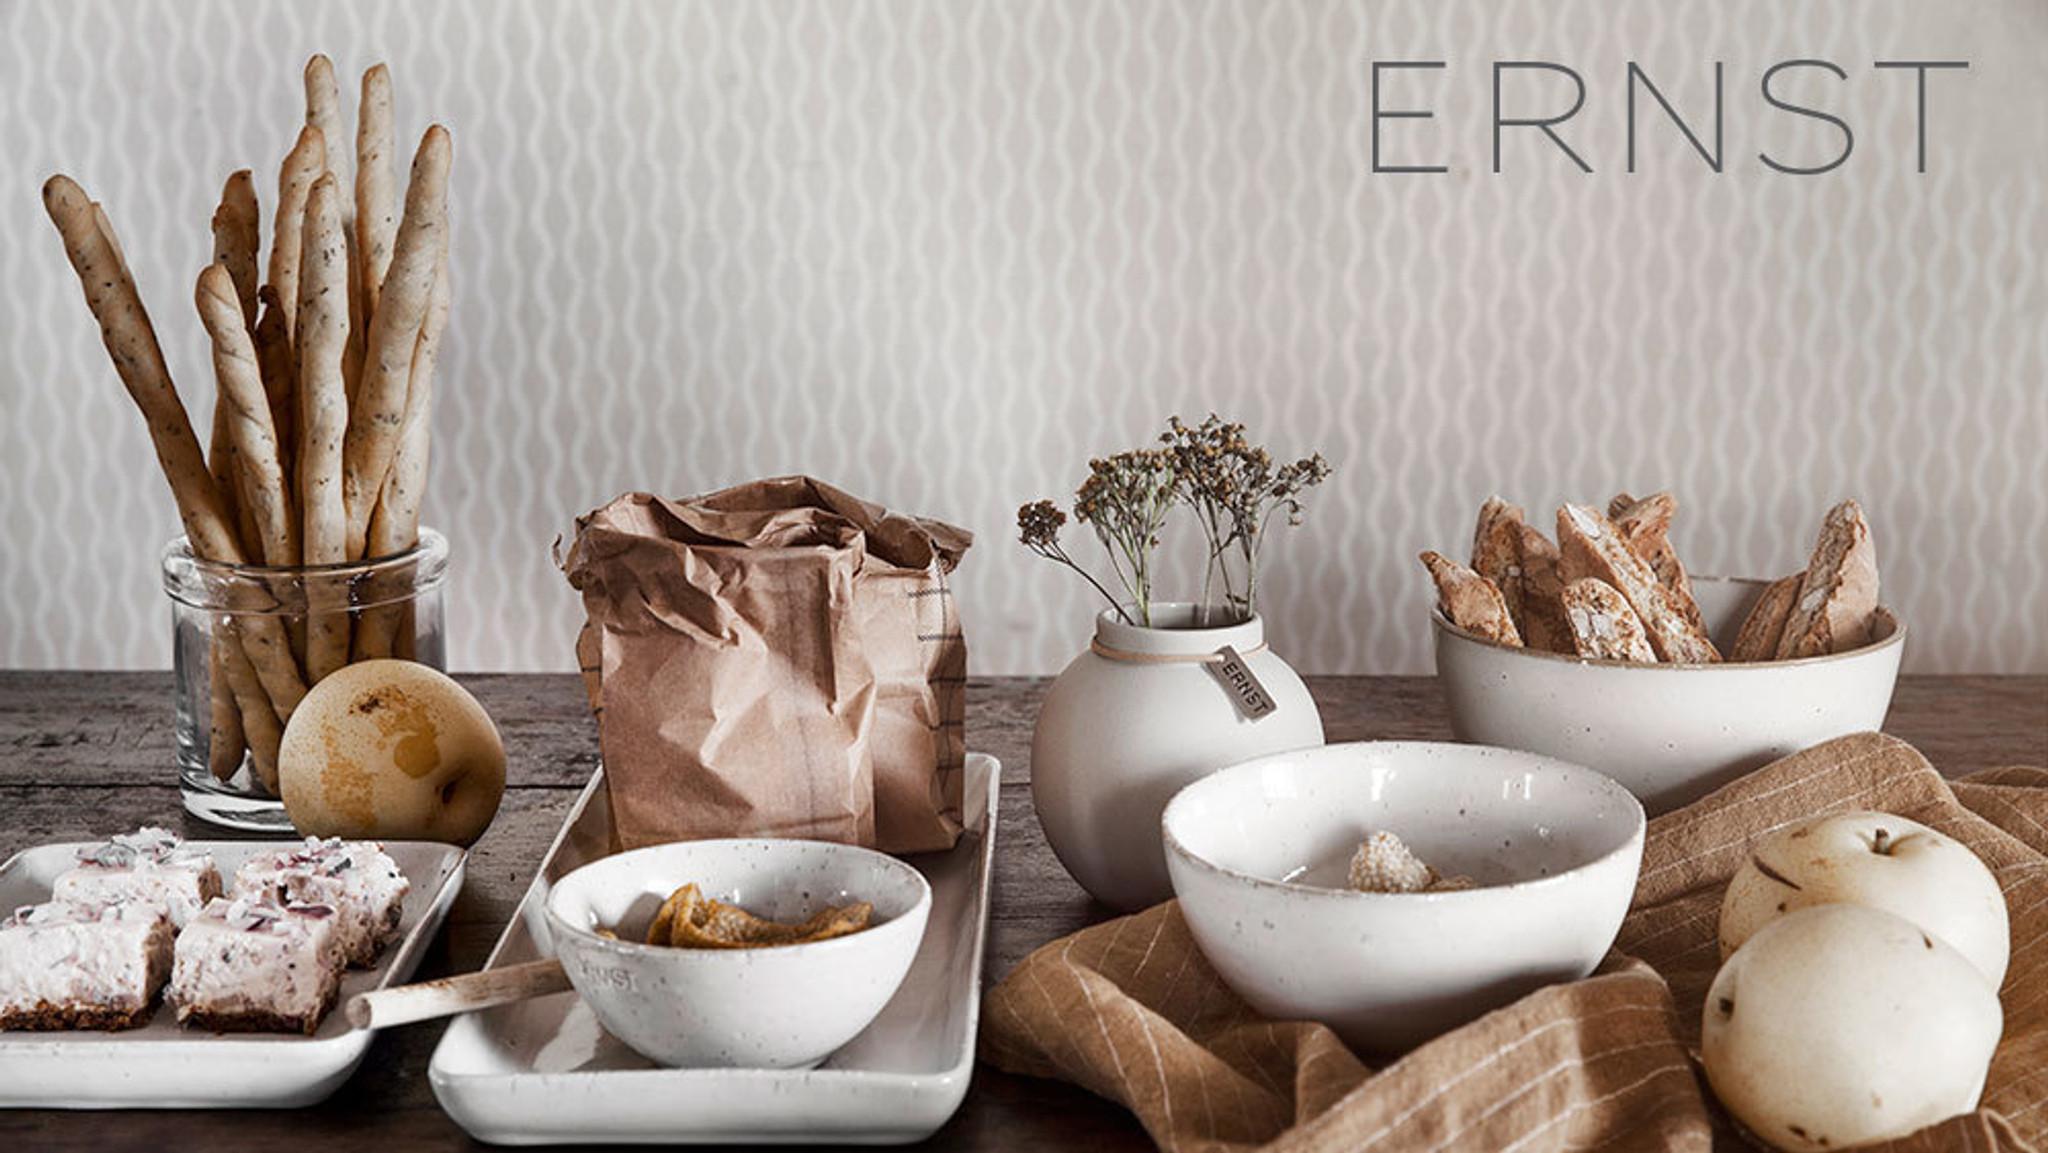 Ernst-Sweden